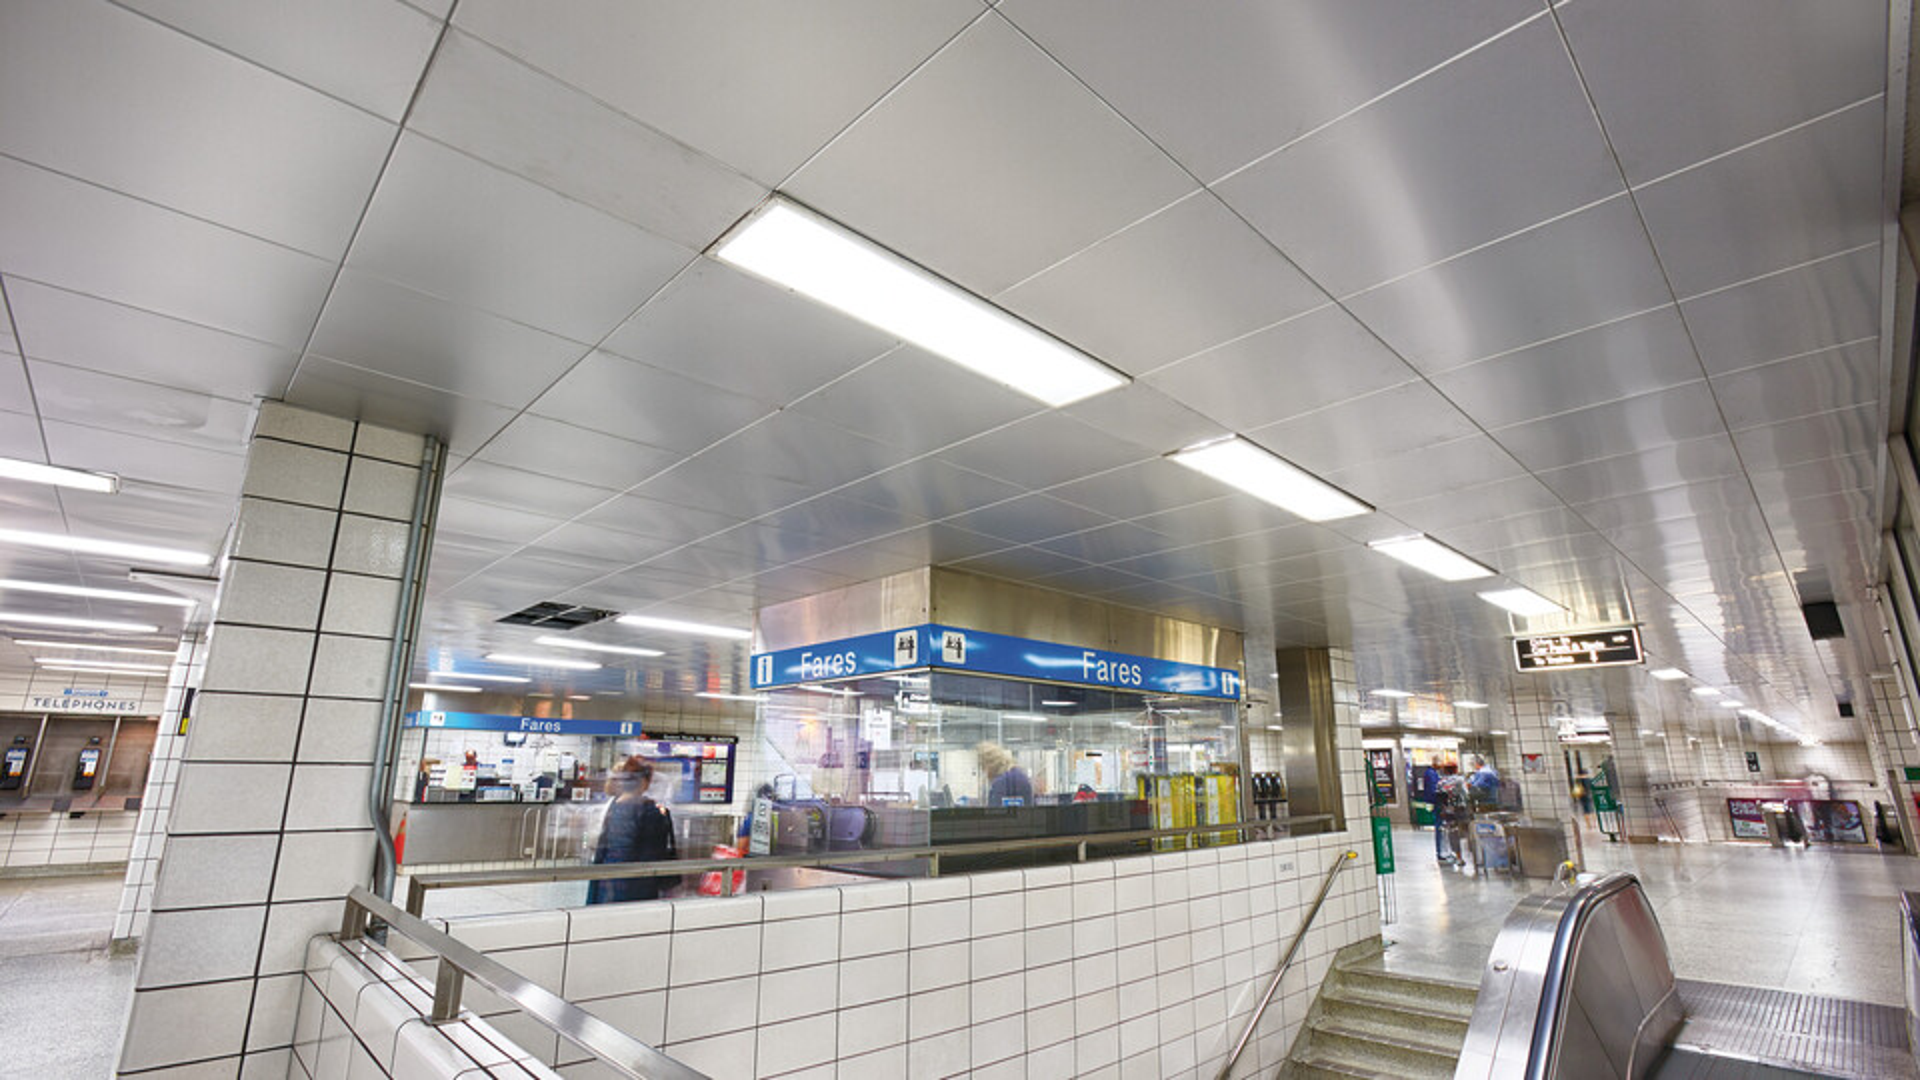 Toronto Transit Comission, Islington Subway, Toronto Transit Comission--Plant Maintenance Department, Arrlin Acoustics, Planostile Snap-in system, Transportation, Mark Borosch Photography